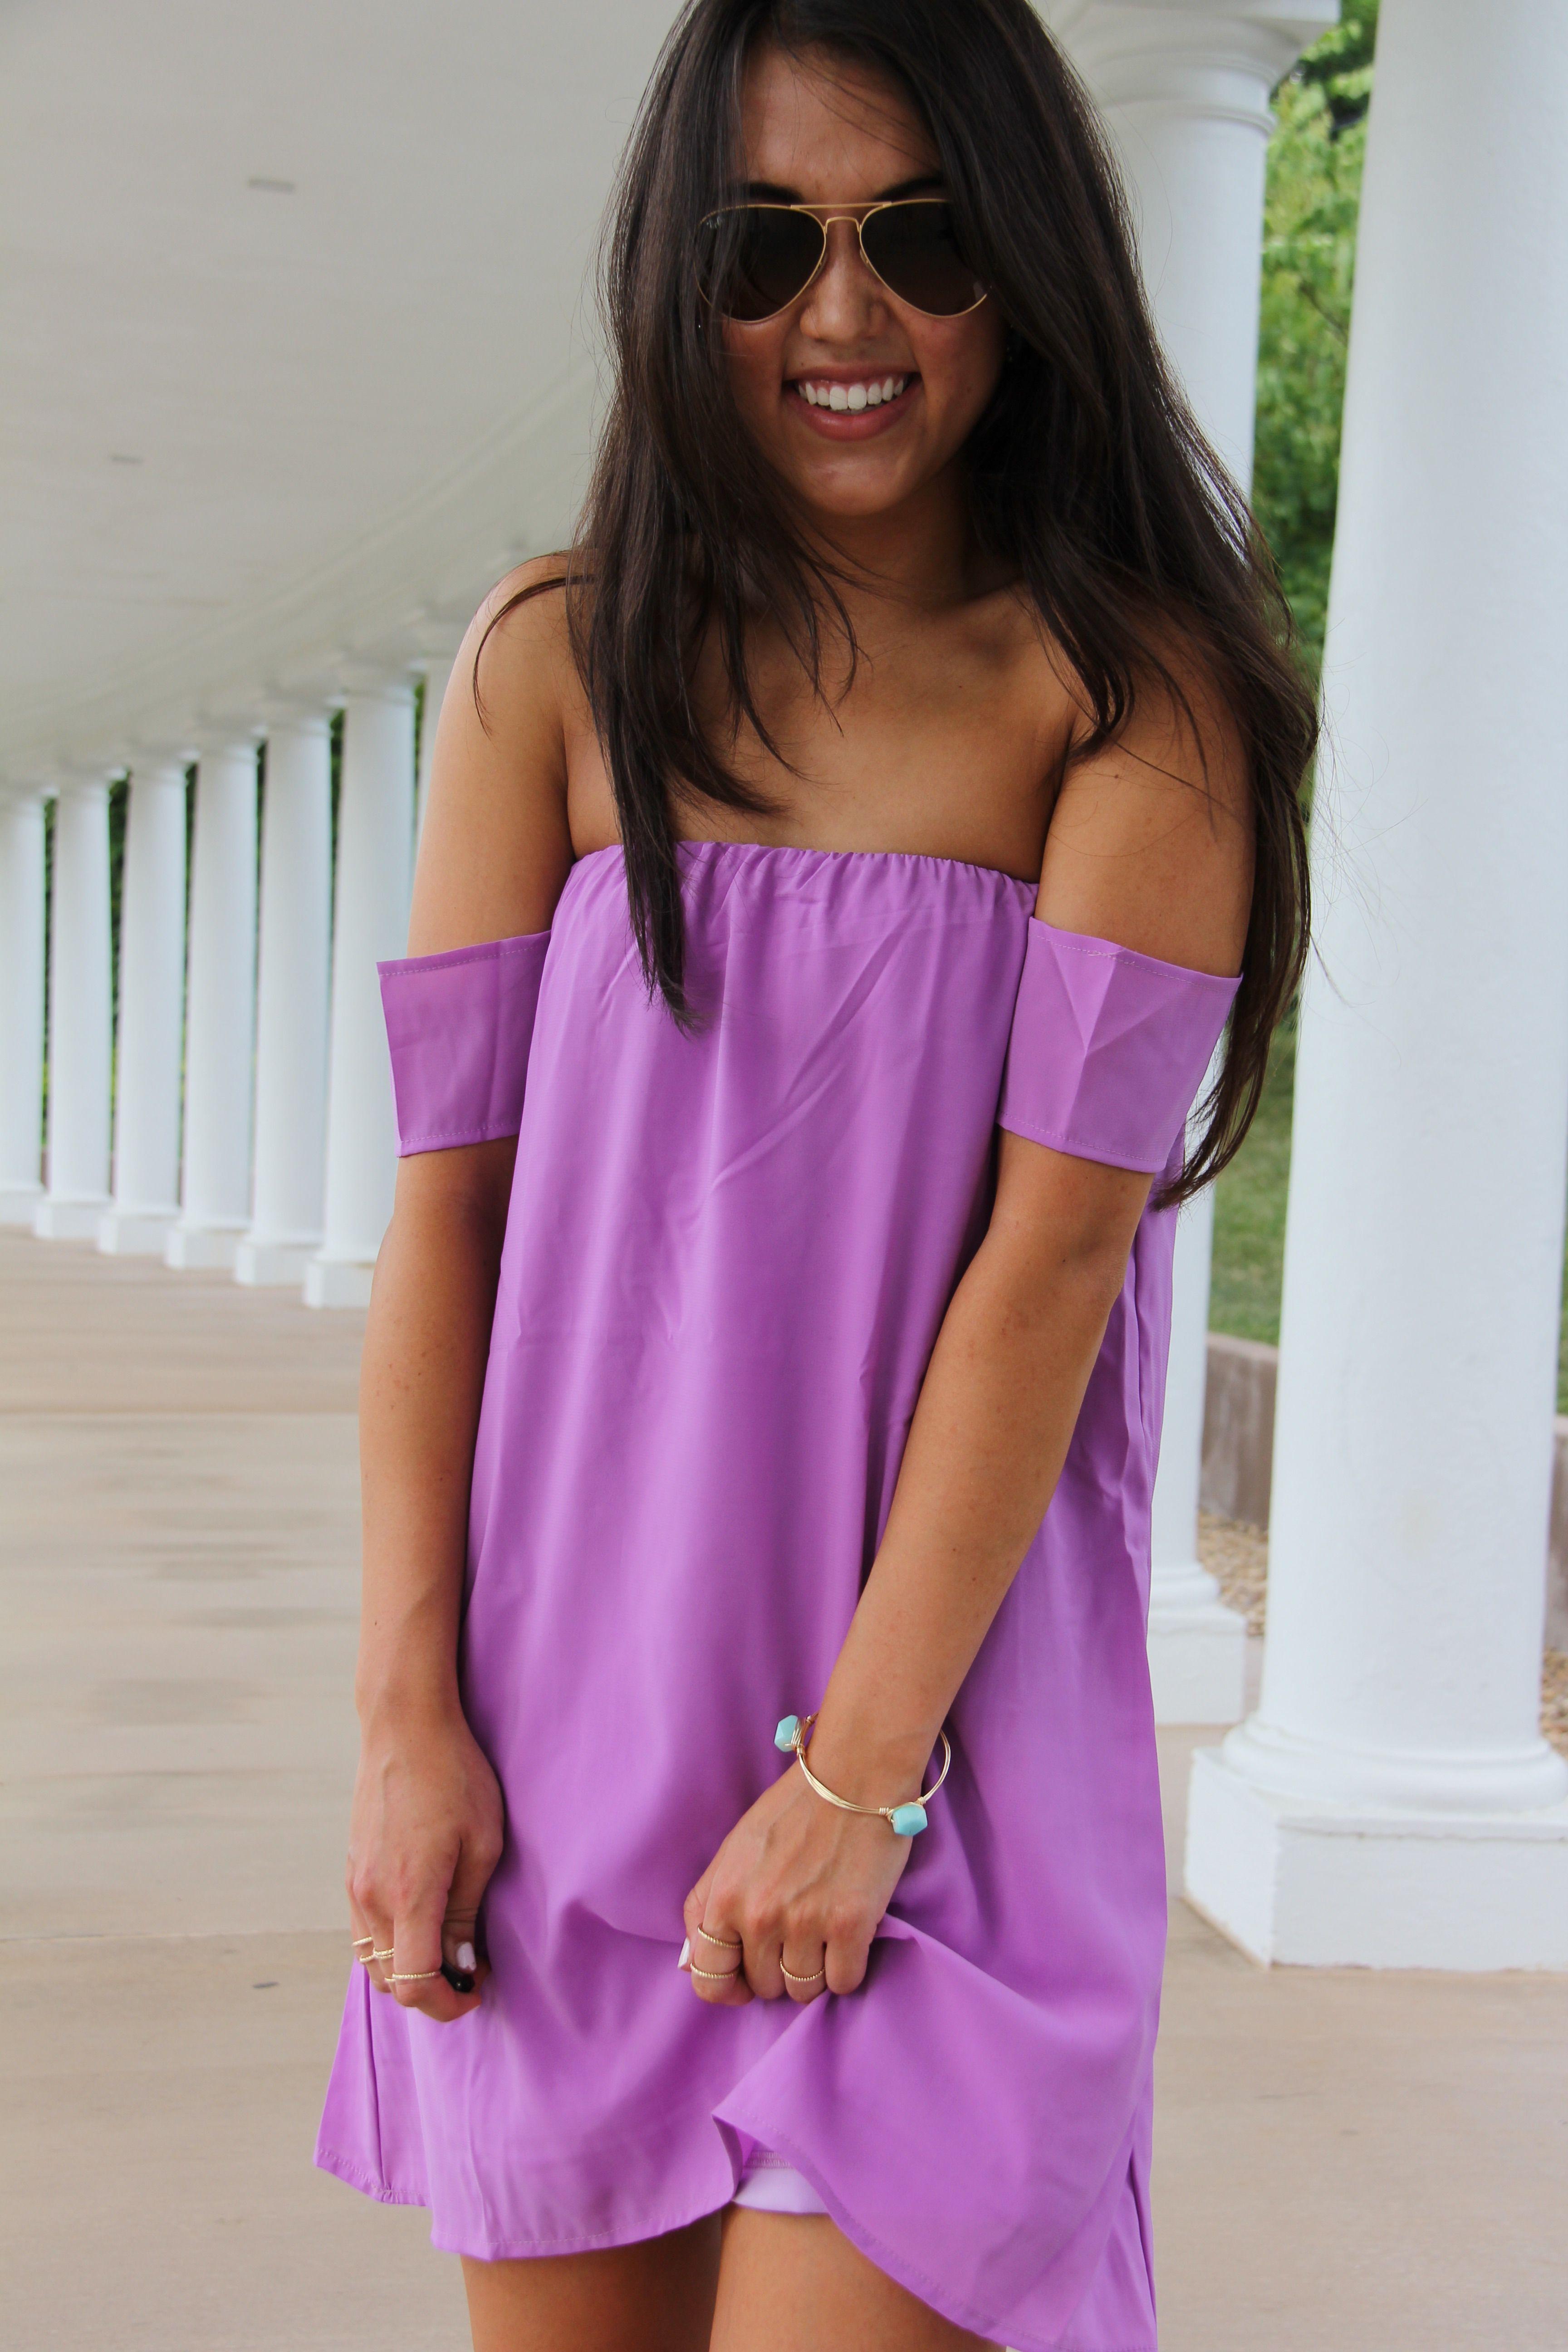 Off The Shoulder Dress Pretty In Purple Fashion Off Shoulder Dresses Warm Weather Fashion [ 5184 x 3456 Pixel ]